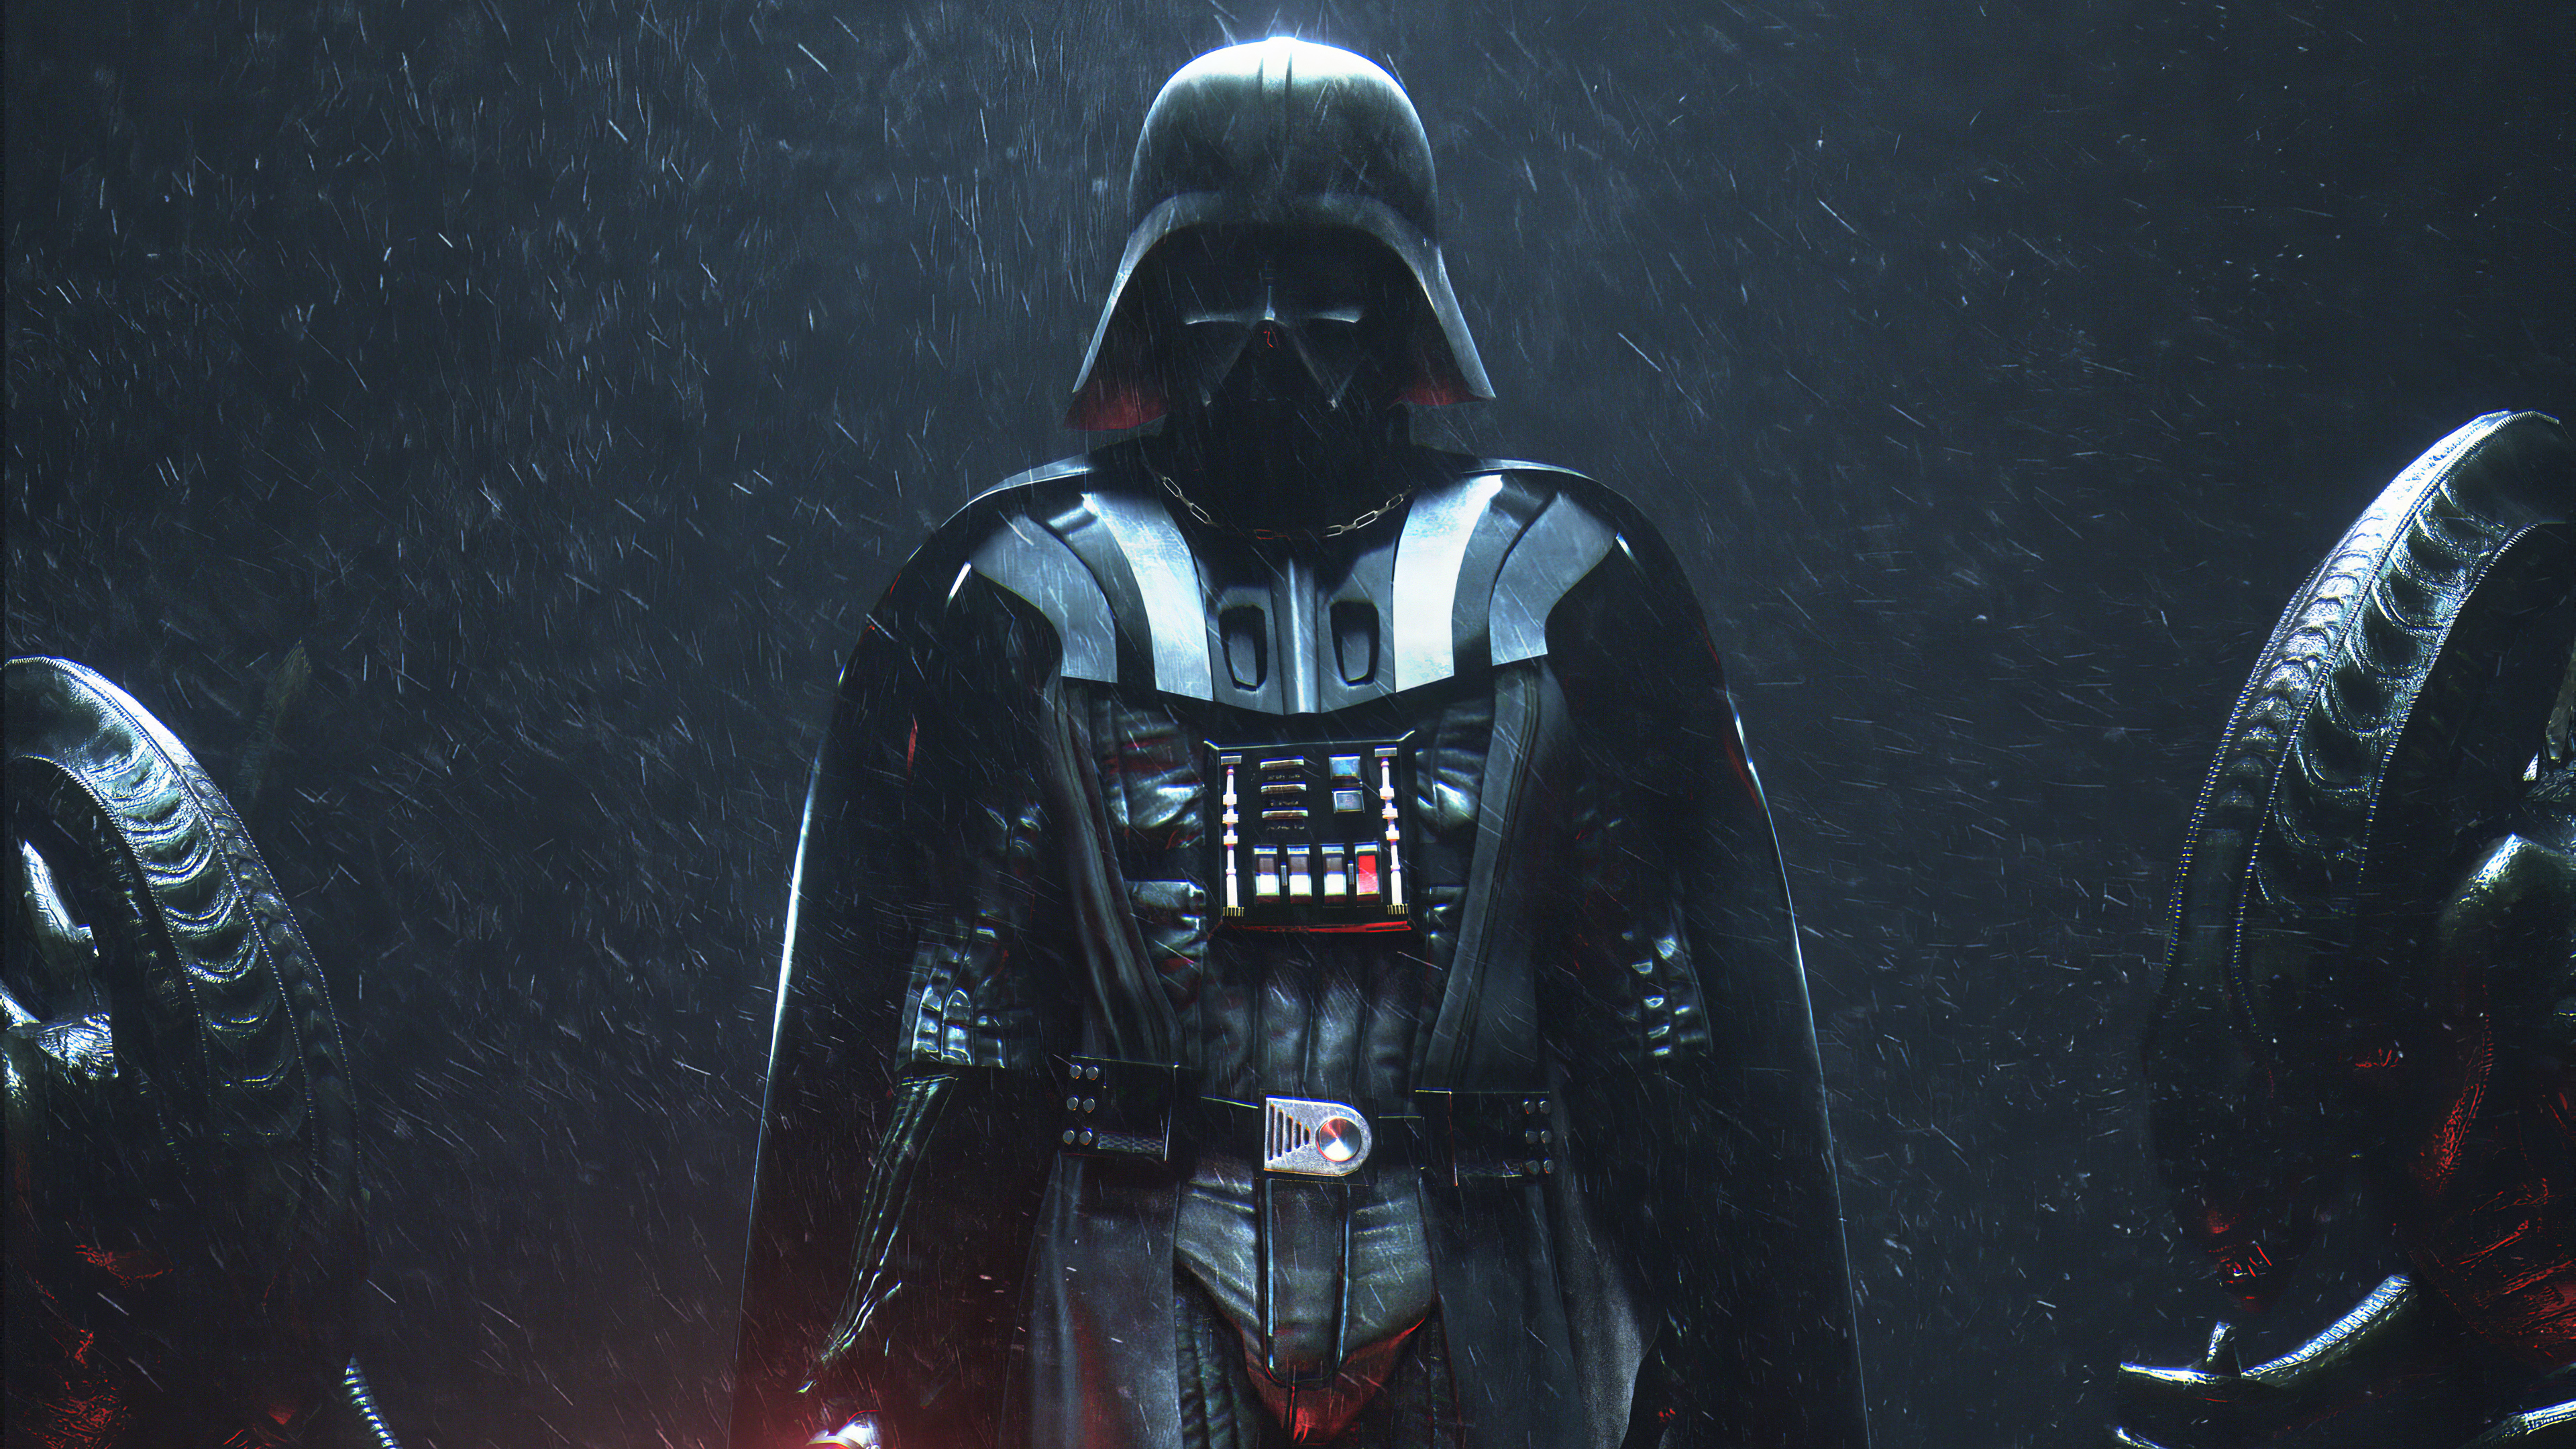 darth vader art 1589579286 - Darth Vader Art - Darth Vader Art wallpapers, Darth Vader Art 4k wallpapers